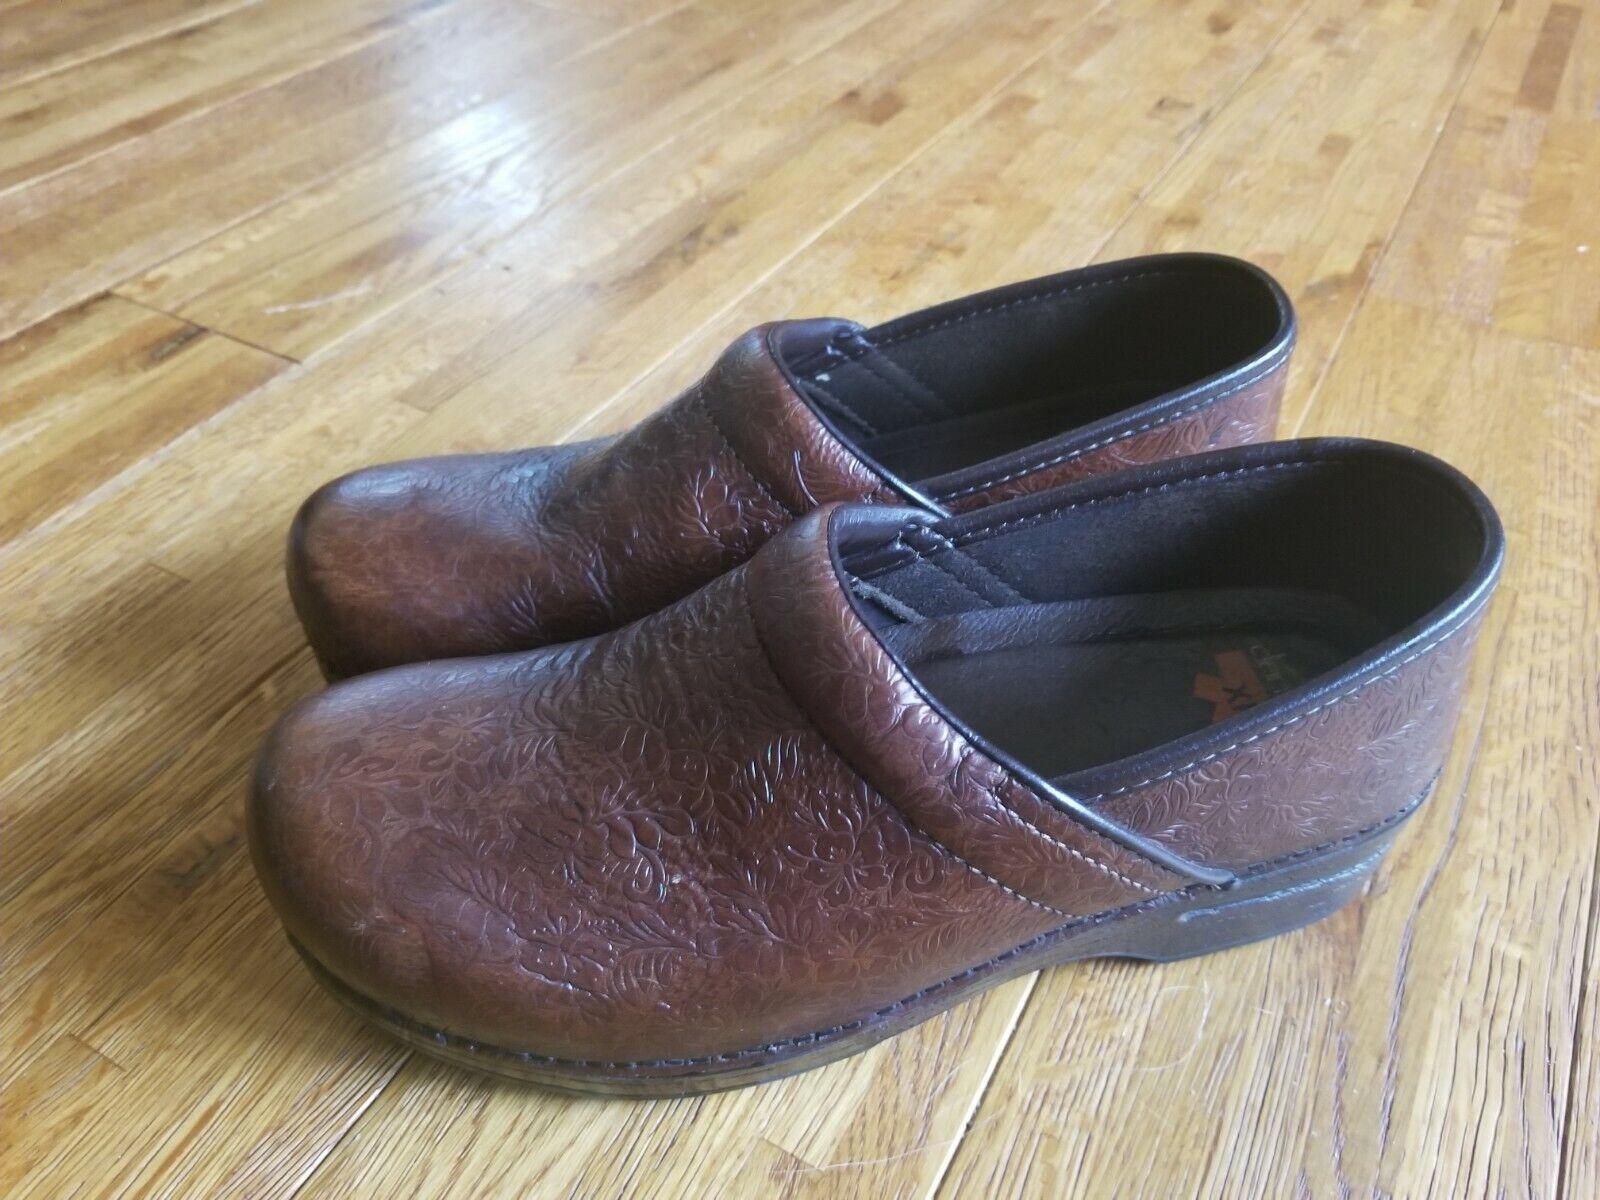 Dansko XP Tooled Leather Clog Size 41